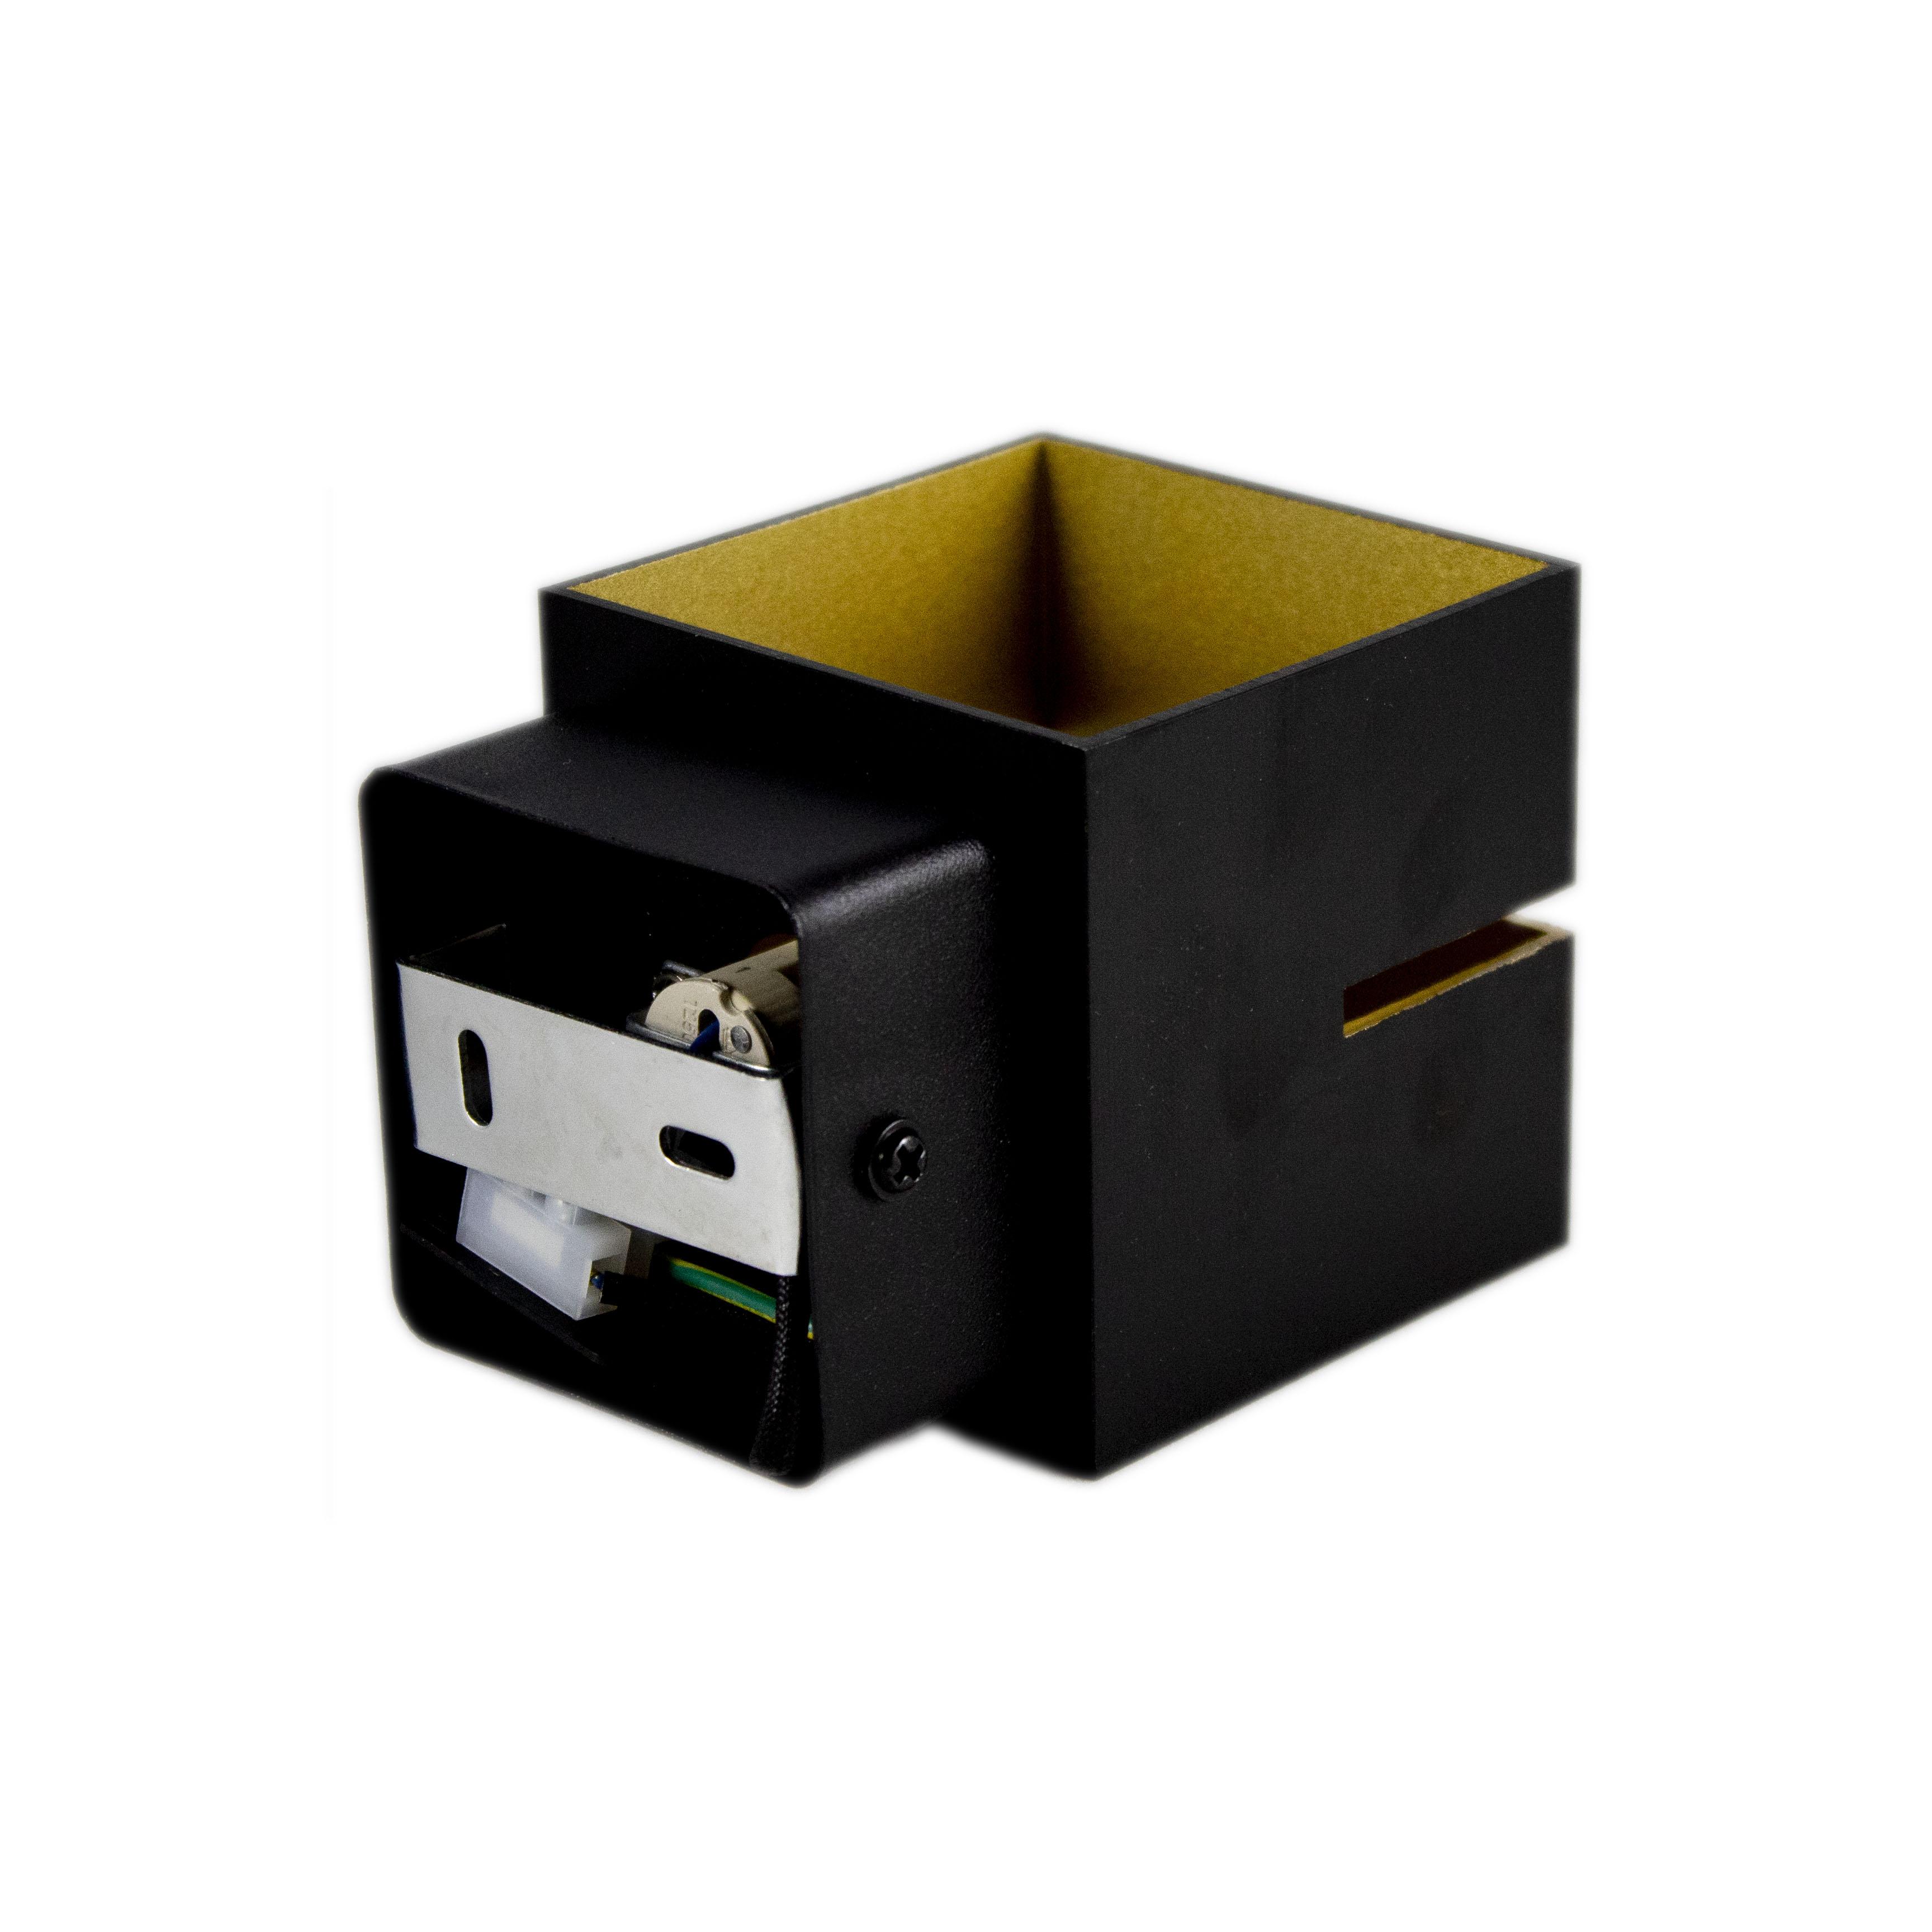 Led wandlamp vierkant zwart goud 2 keer G9 fitting - ip20 - achterkant bevestiging